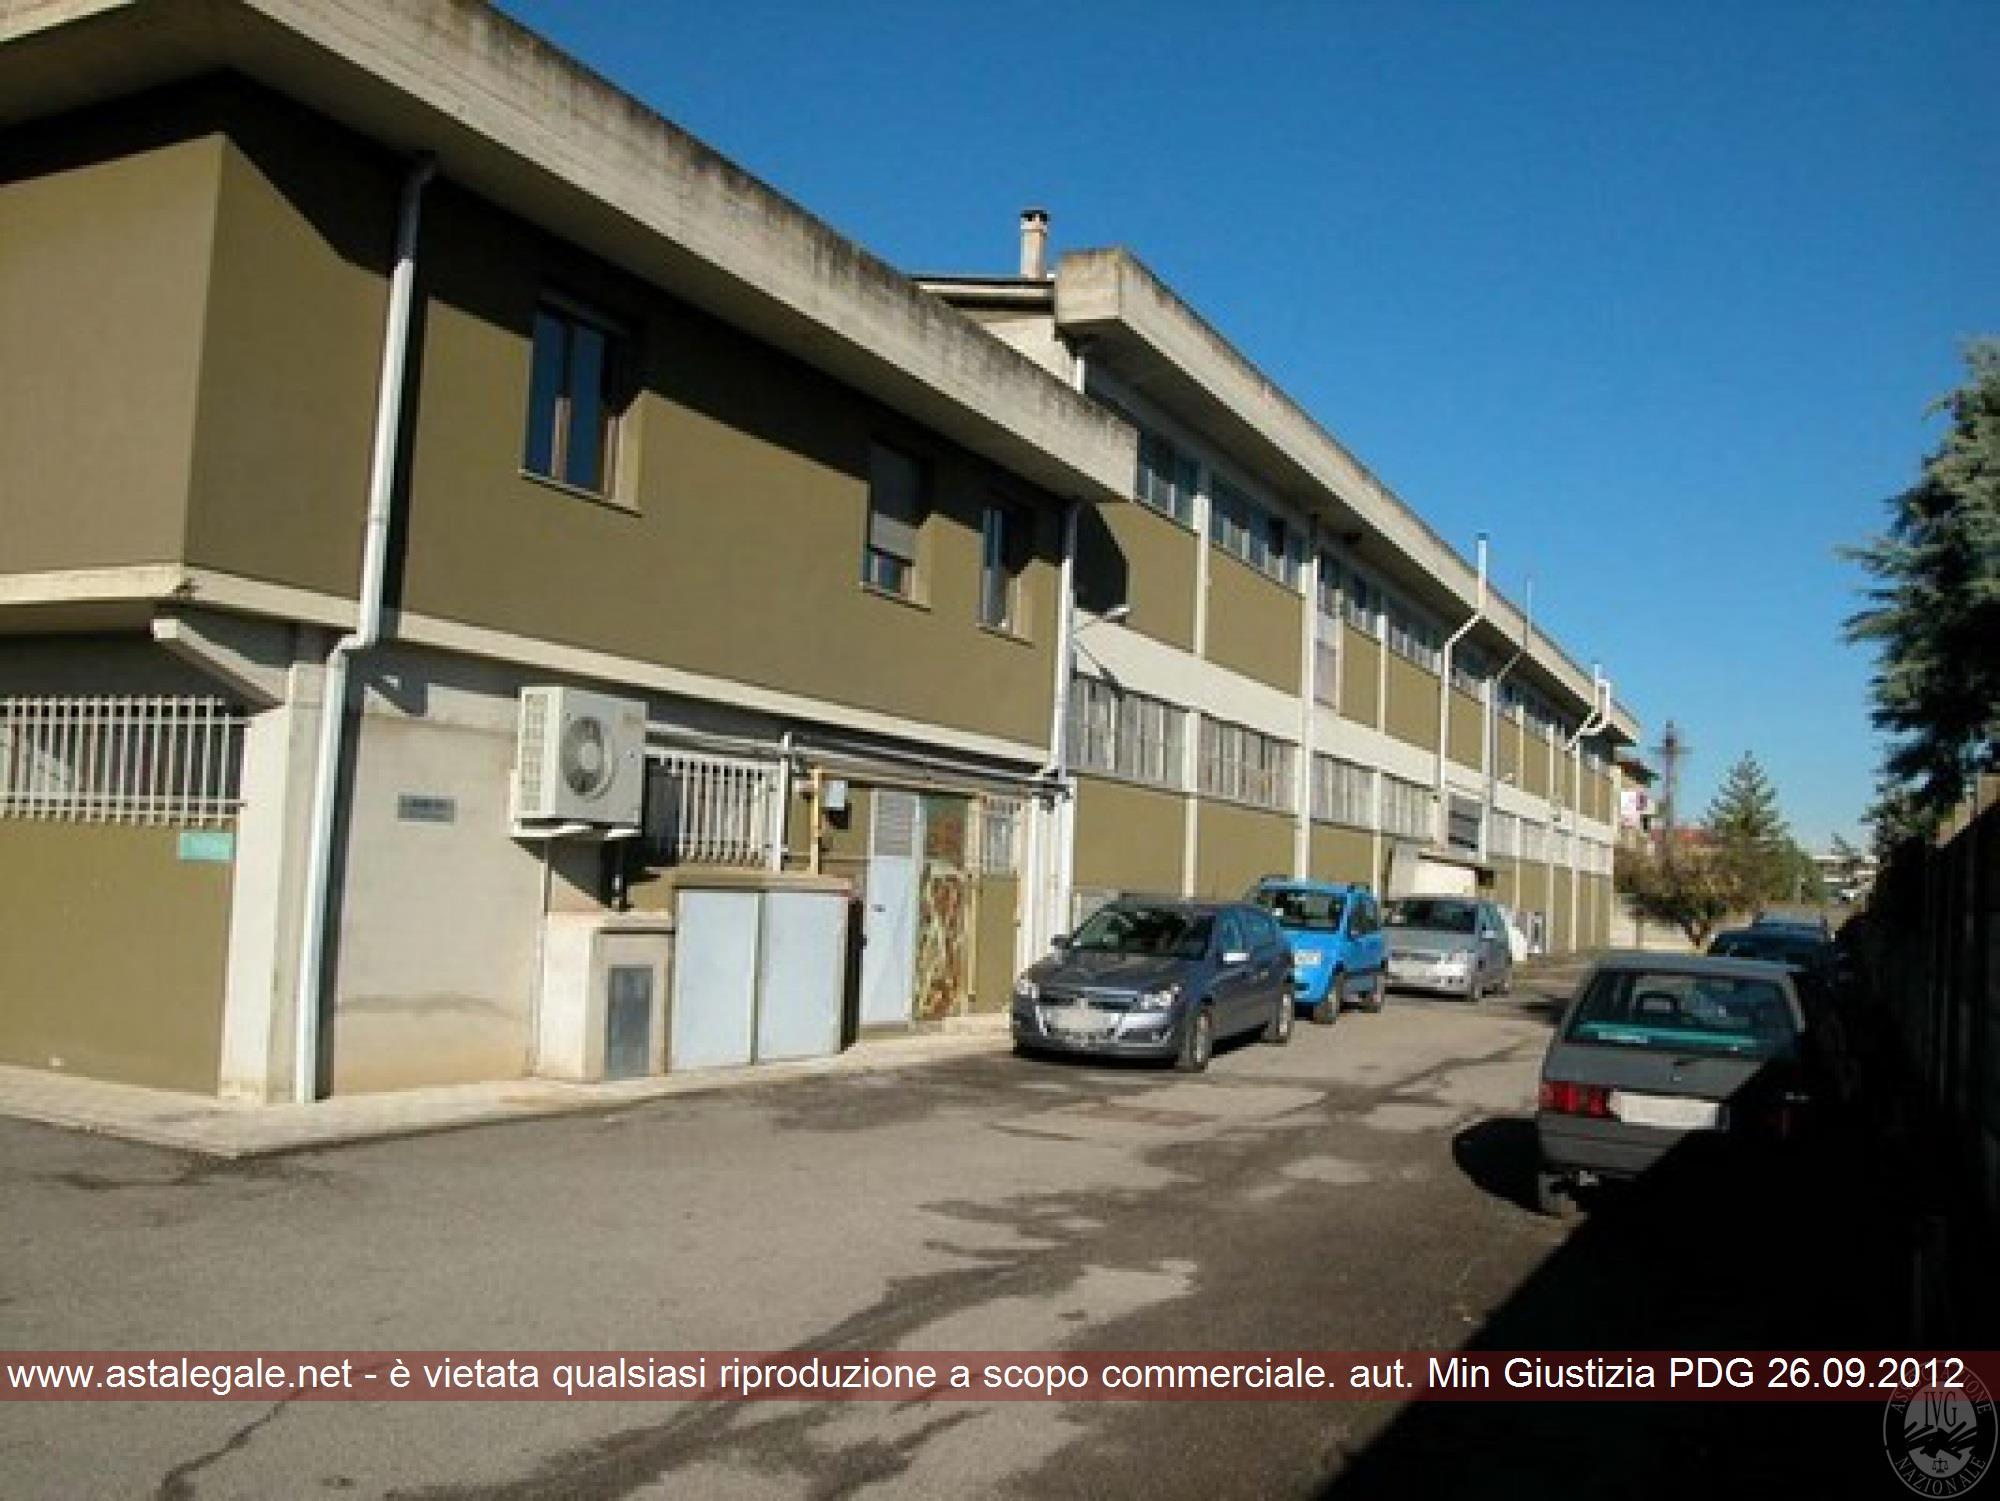 Arezzo (AR) Via F. Baracca 68